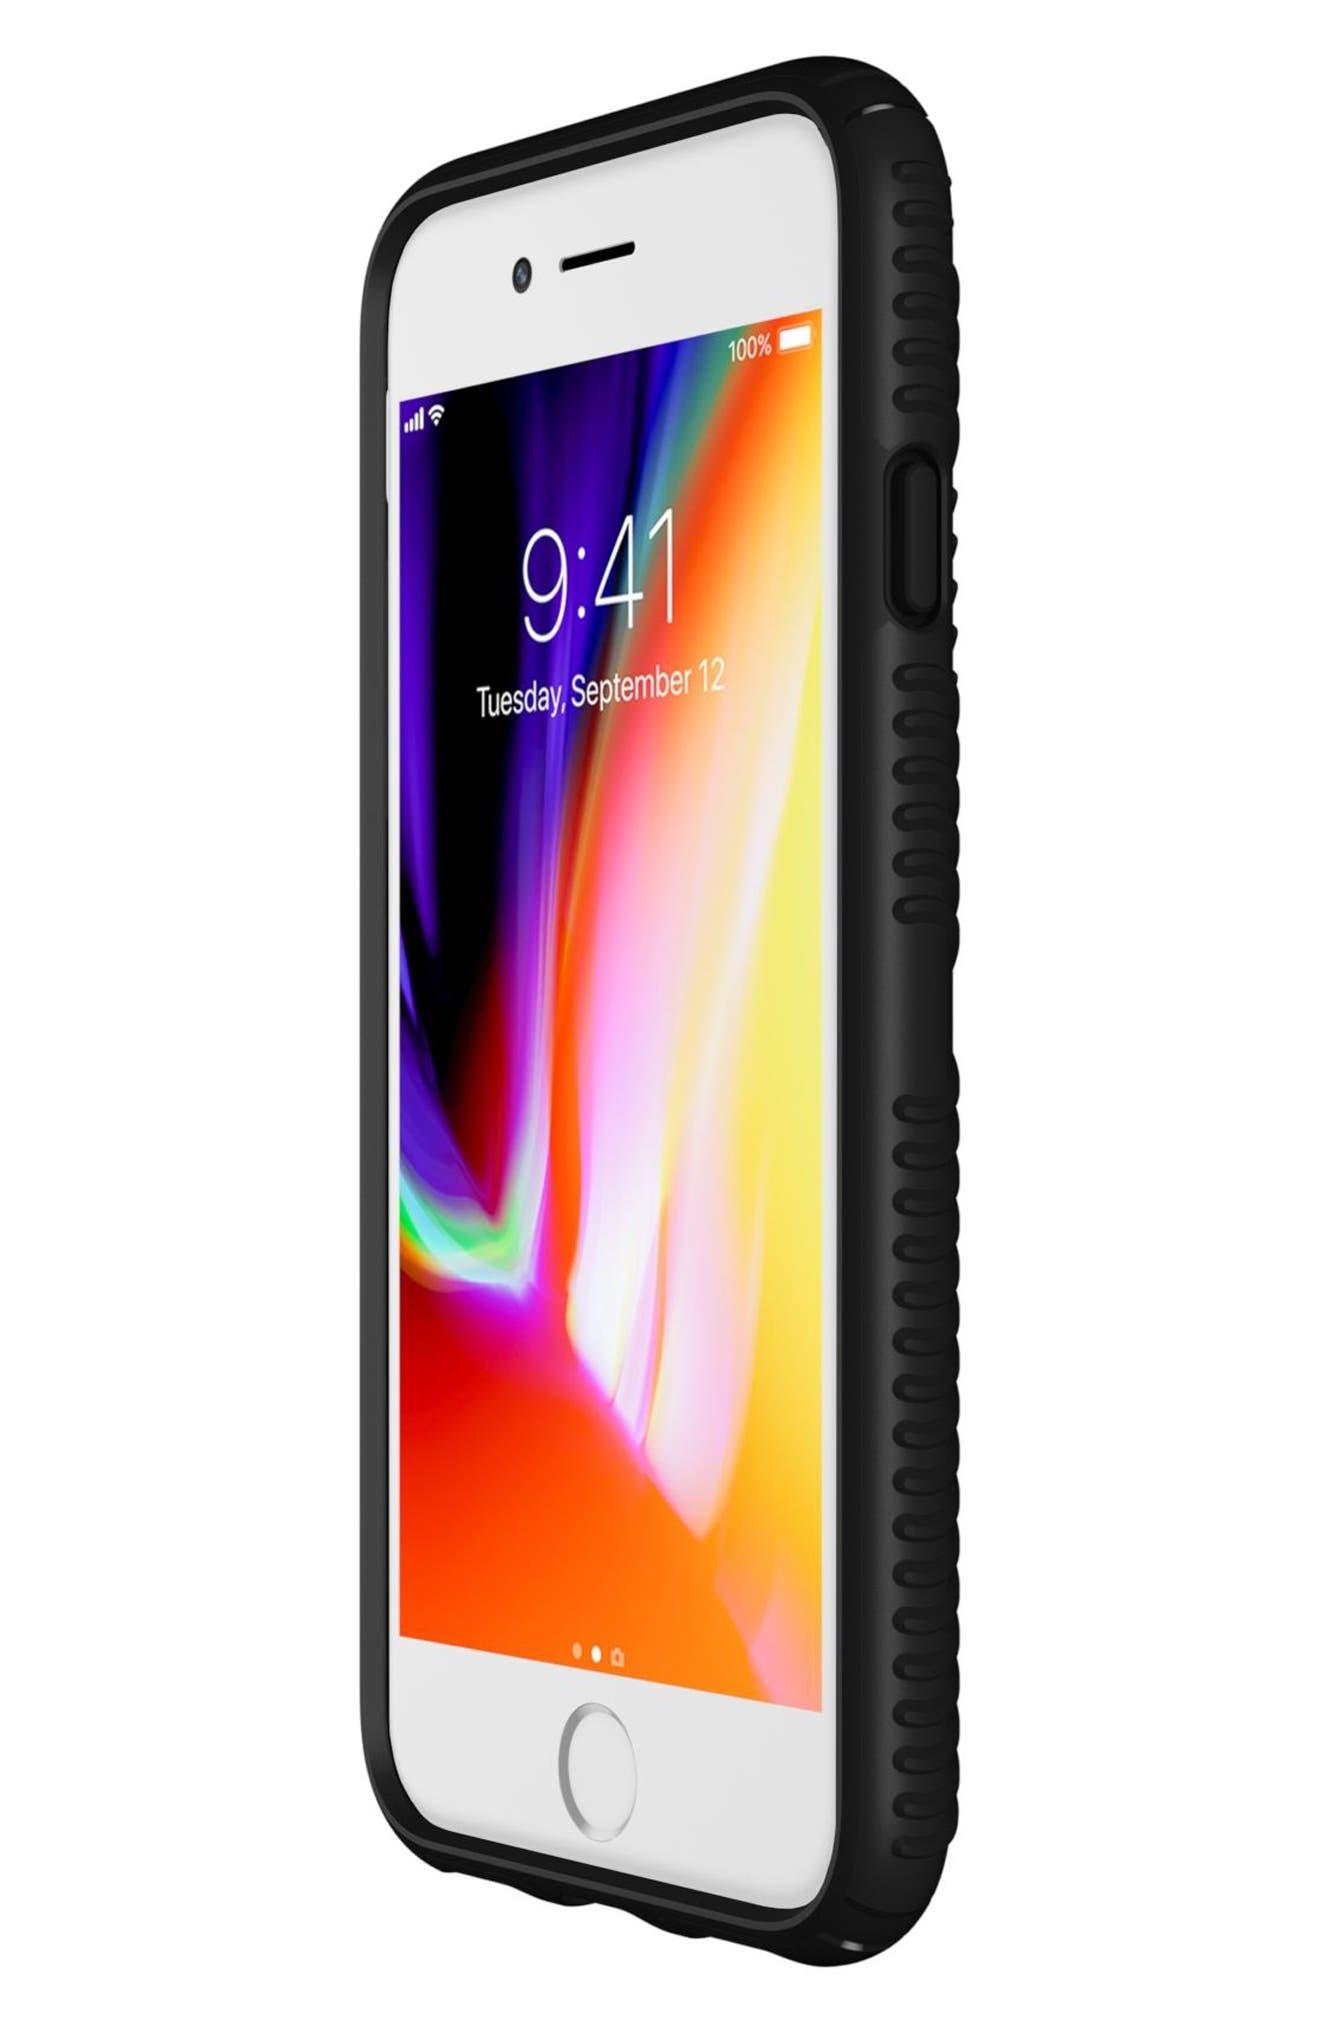 SPECK, Grip iPhone 6/6s/7/8 Case, Alternate thumbnail 6, color, 001